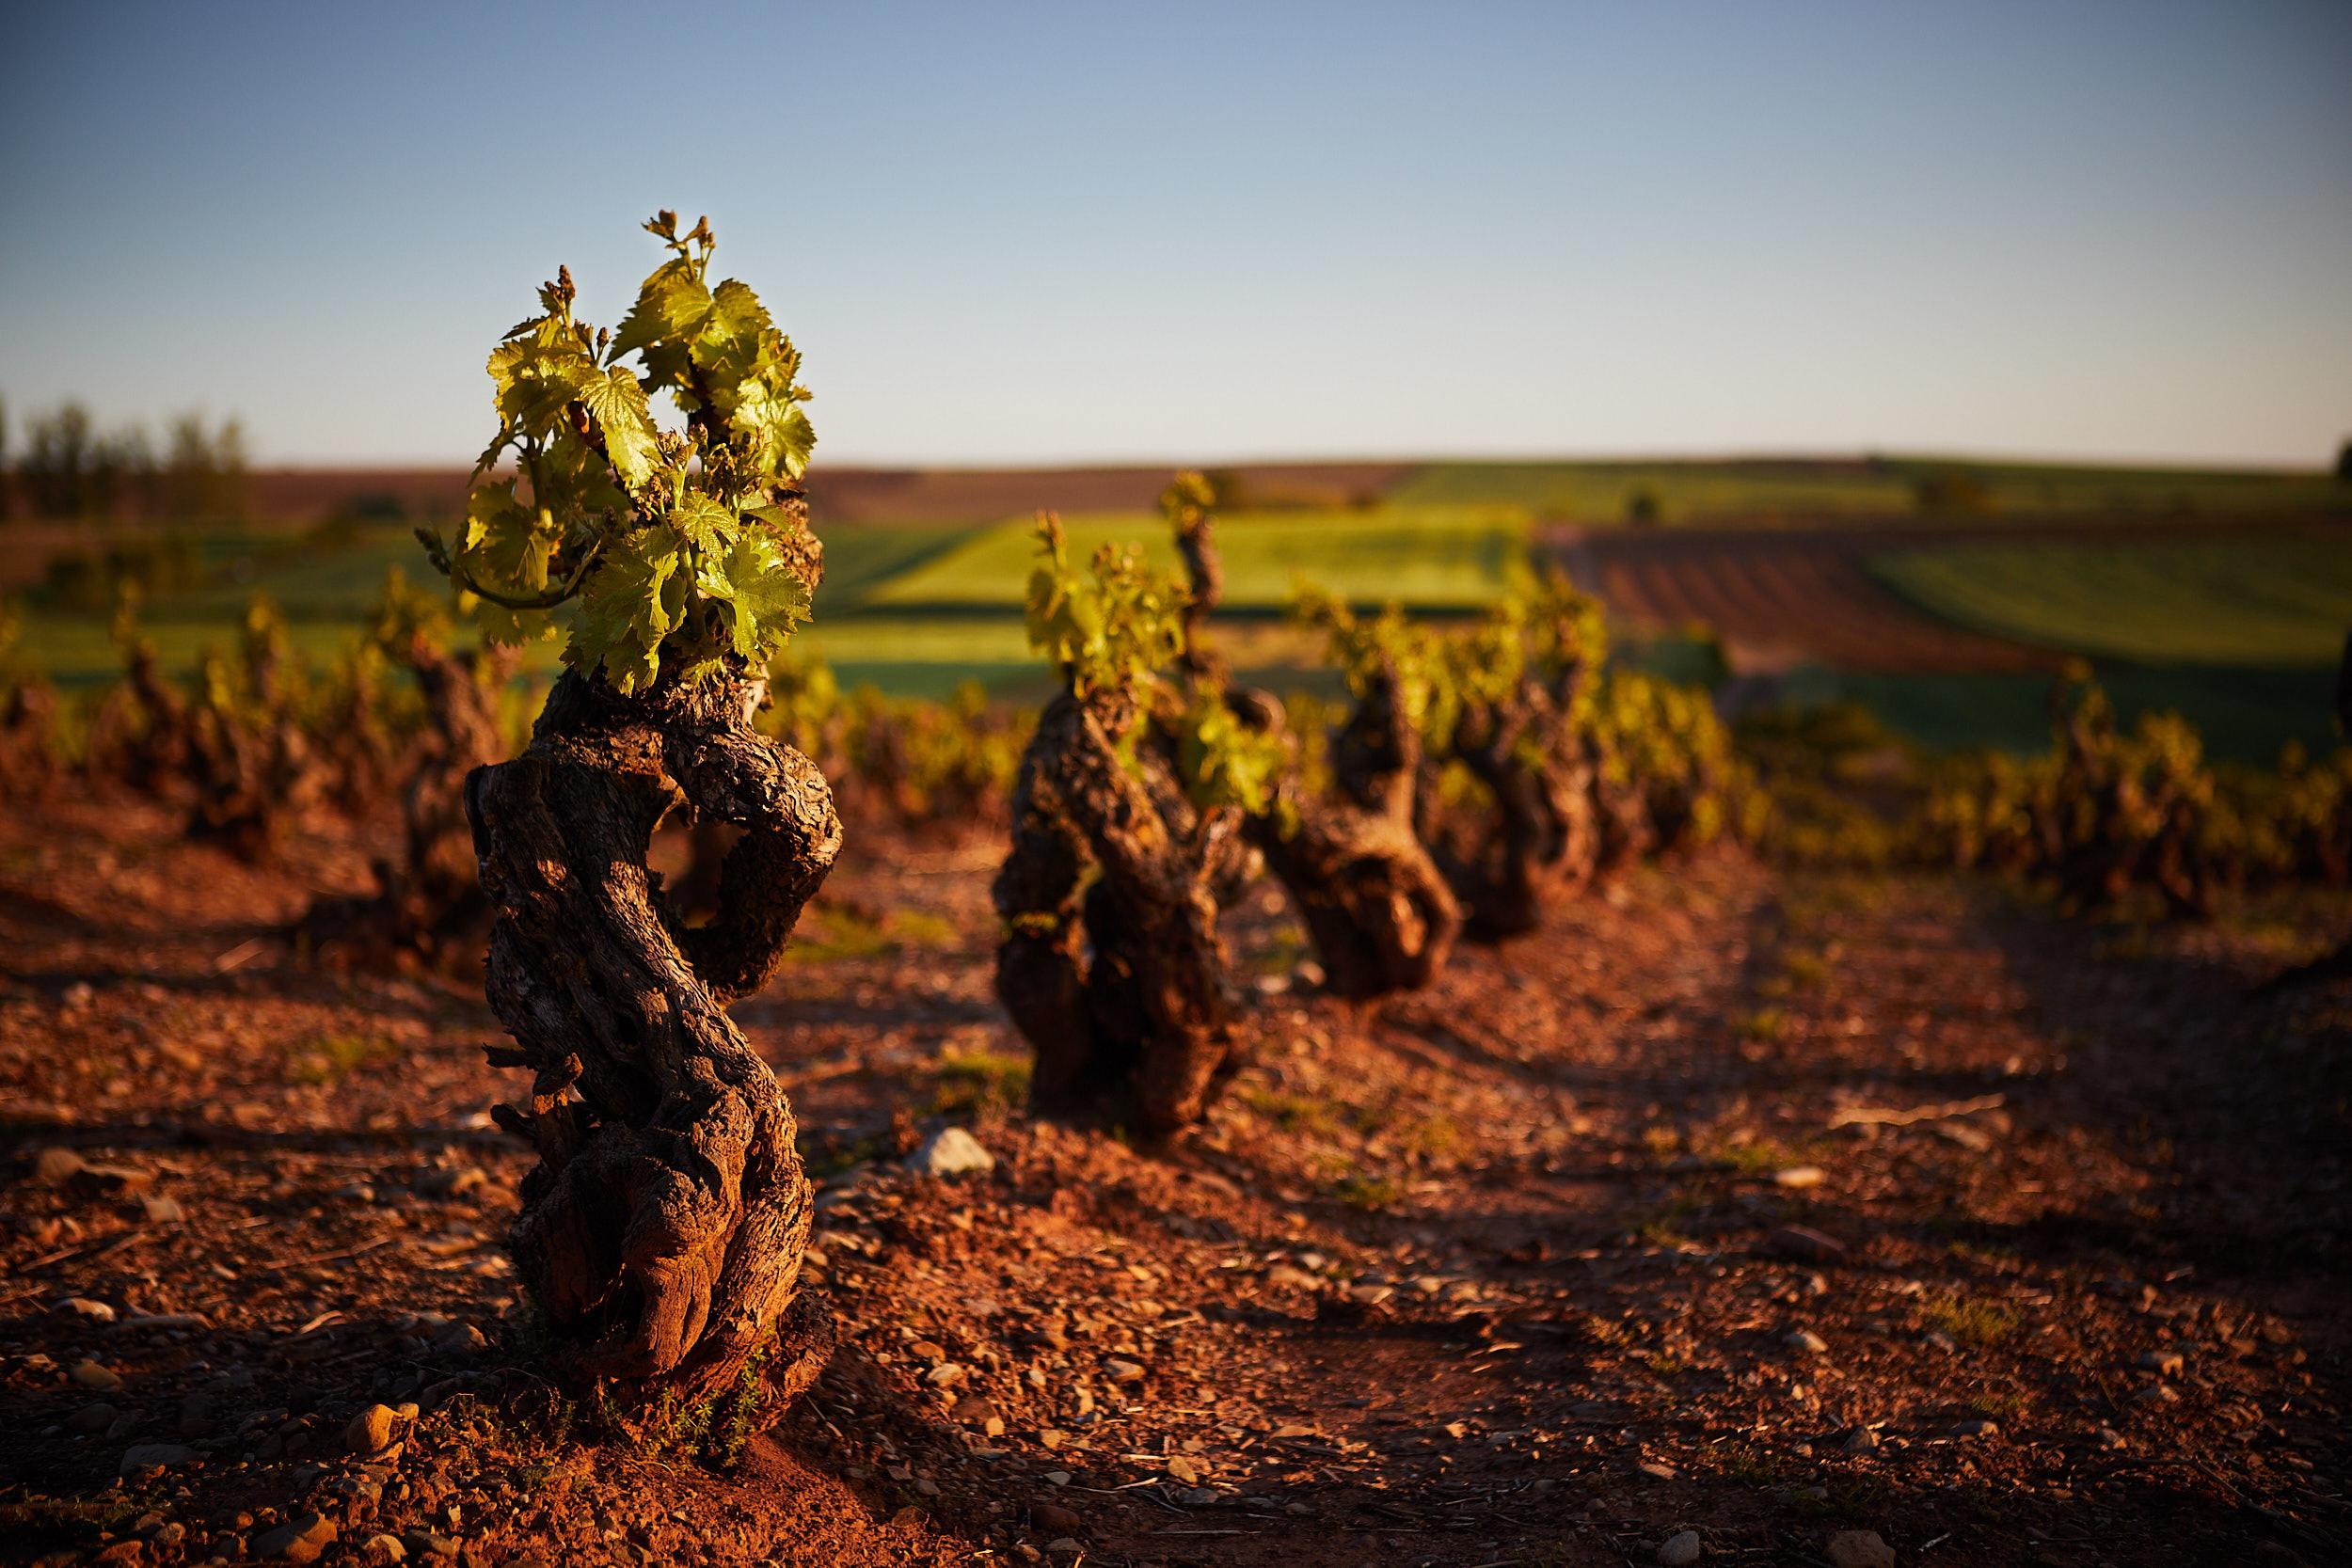 11/5/18 Viñedos de Badarán, La Rioja, España. Photo by James Sturcke | sturcke.org